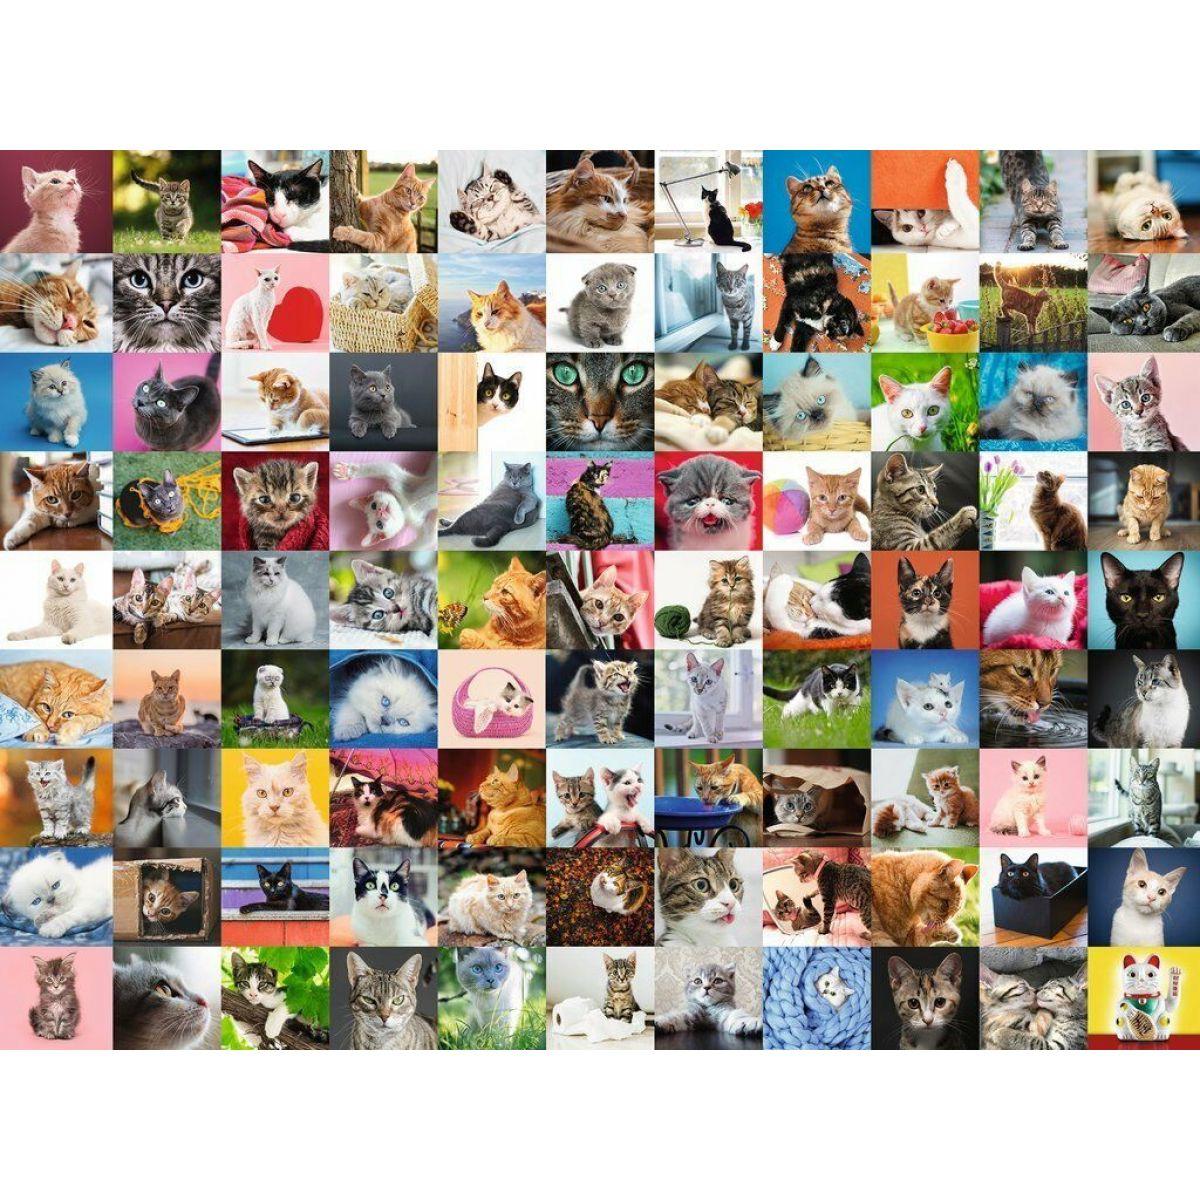 Ravensburger puzzle 162352 99 mačiek 1500 dielikov